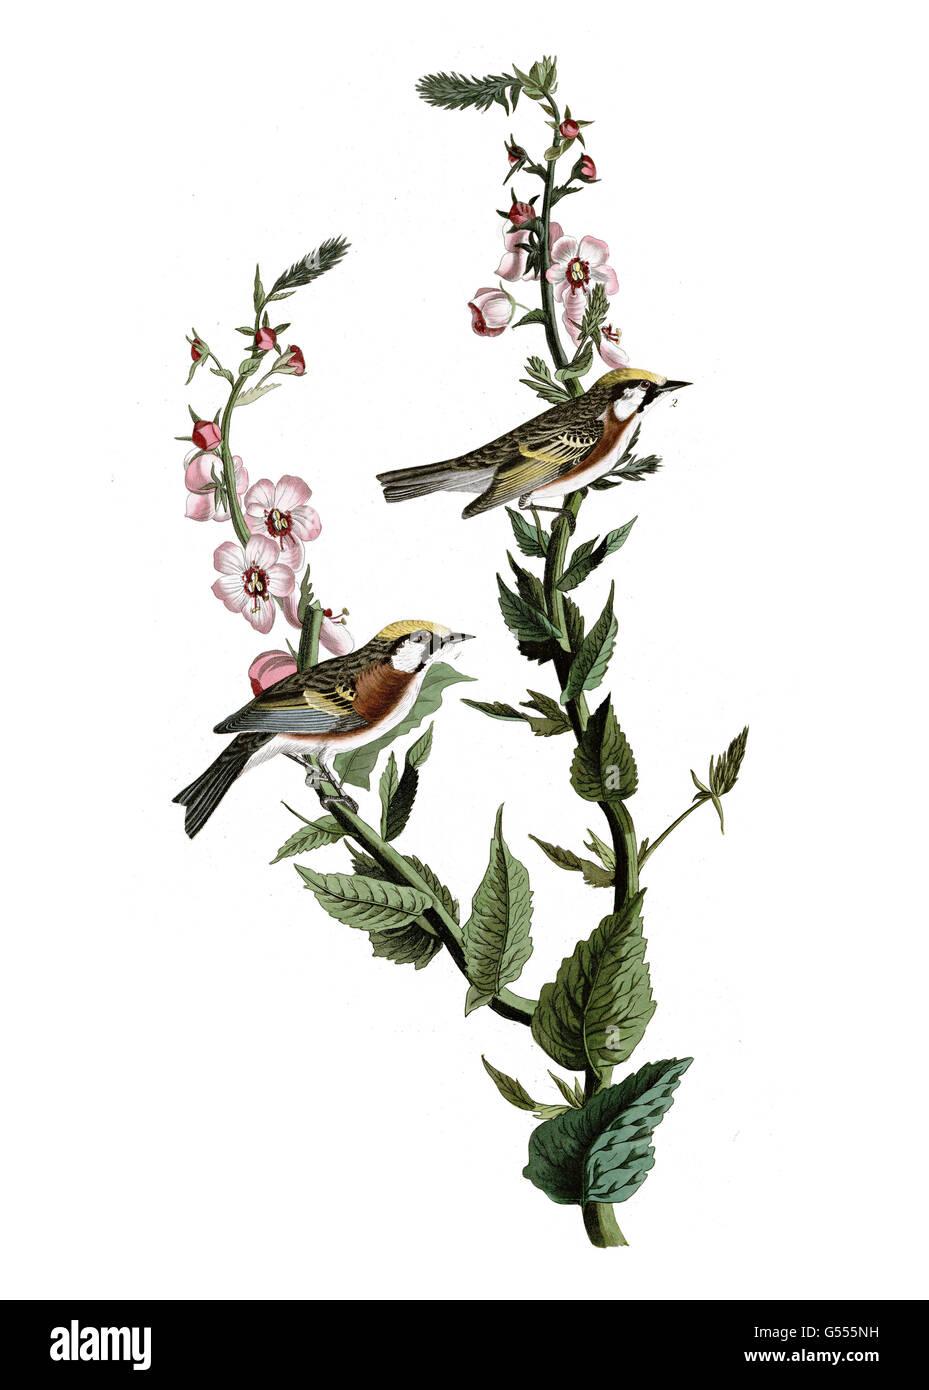 Chestnut-sided Warbler, Dendroica pensylvanica, birds, 1827 - 1838 Stock Photo